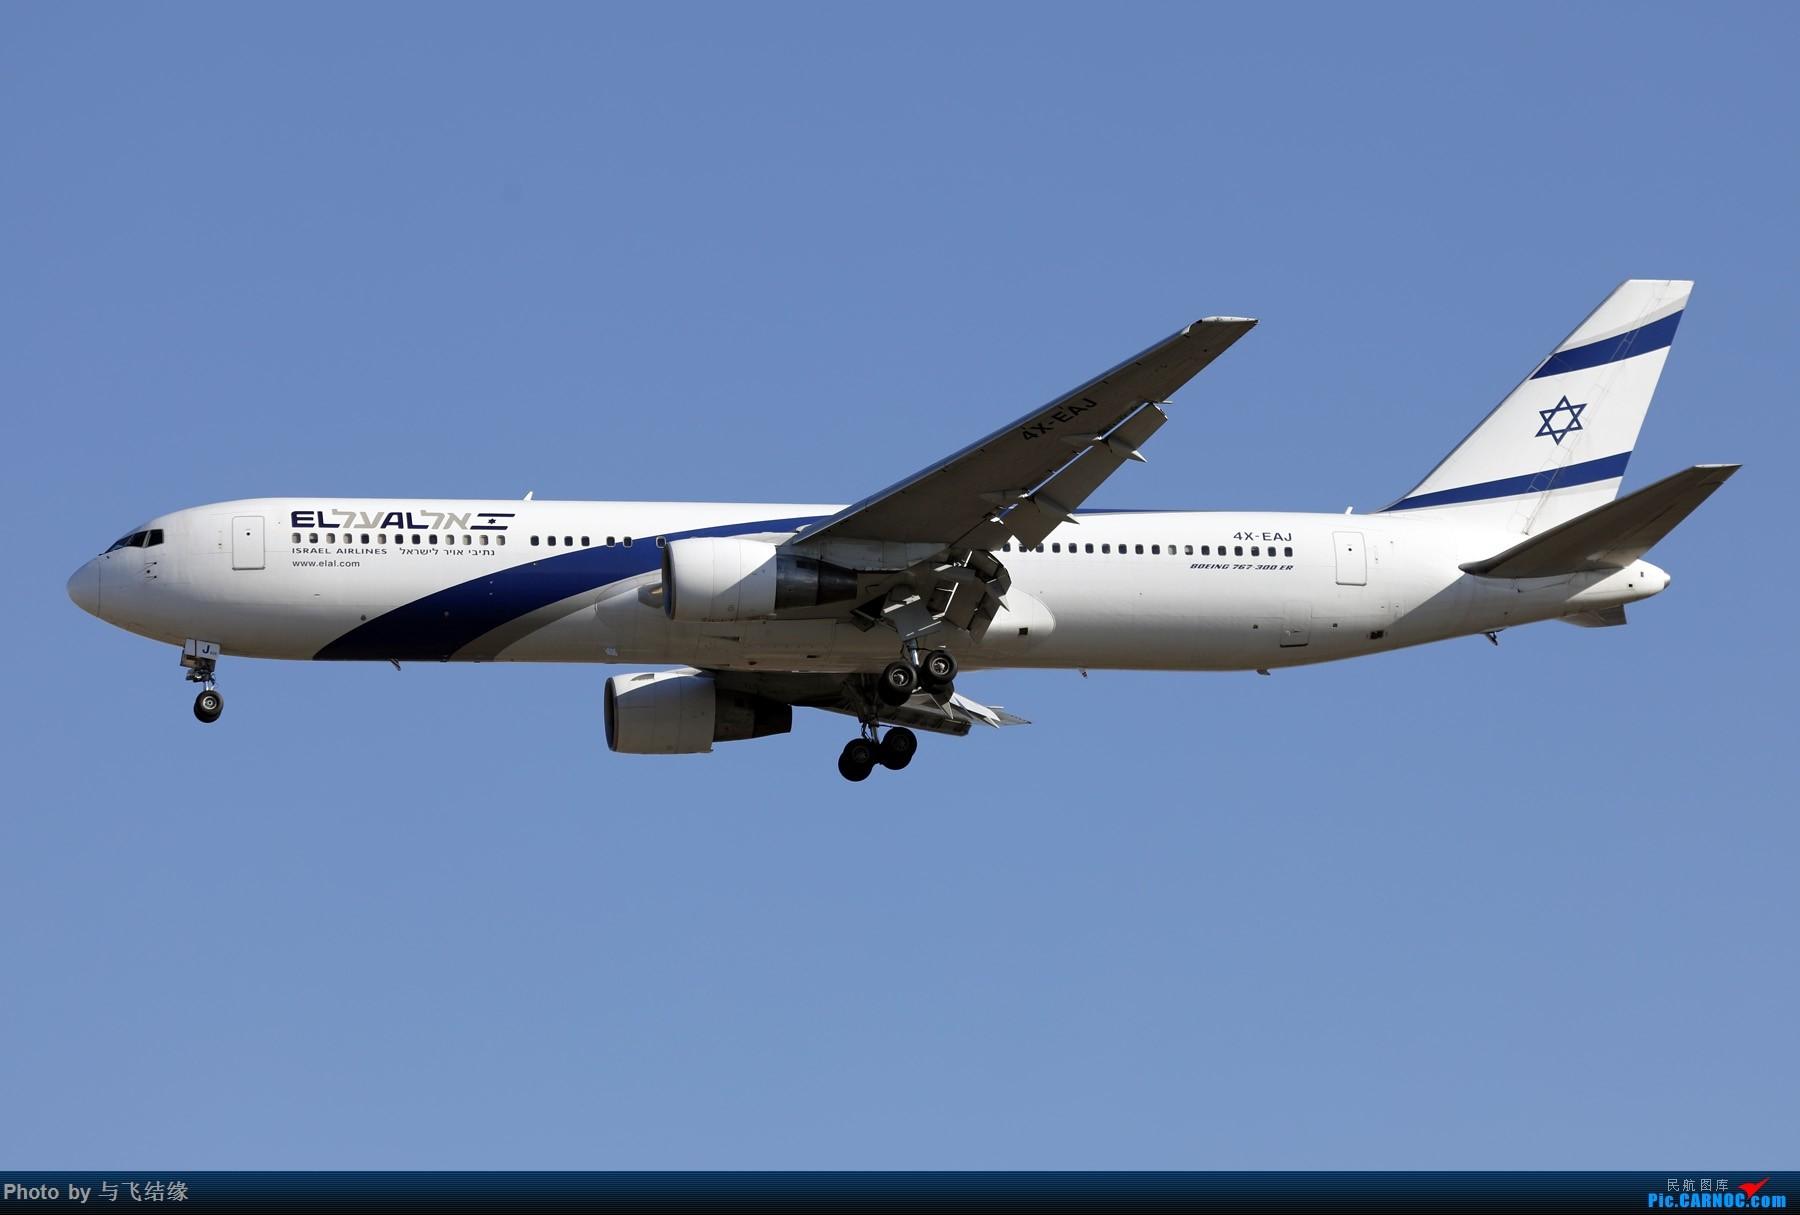 Re:[原创]新年第一贴,2019年诸事顺利。 BOEING 767-300ER 4X-EAI 中国北京首都国际机场